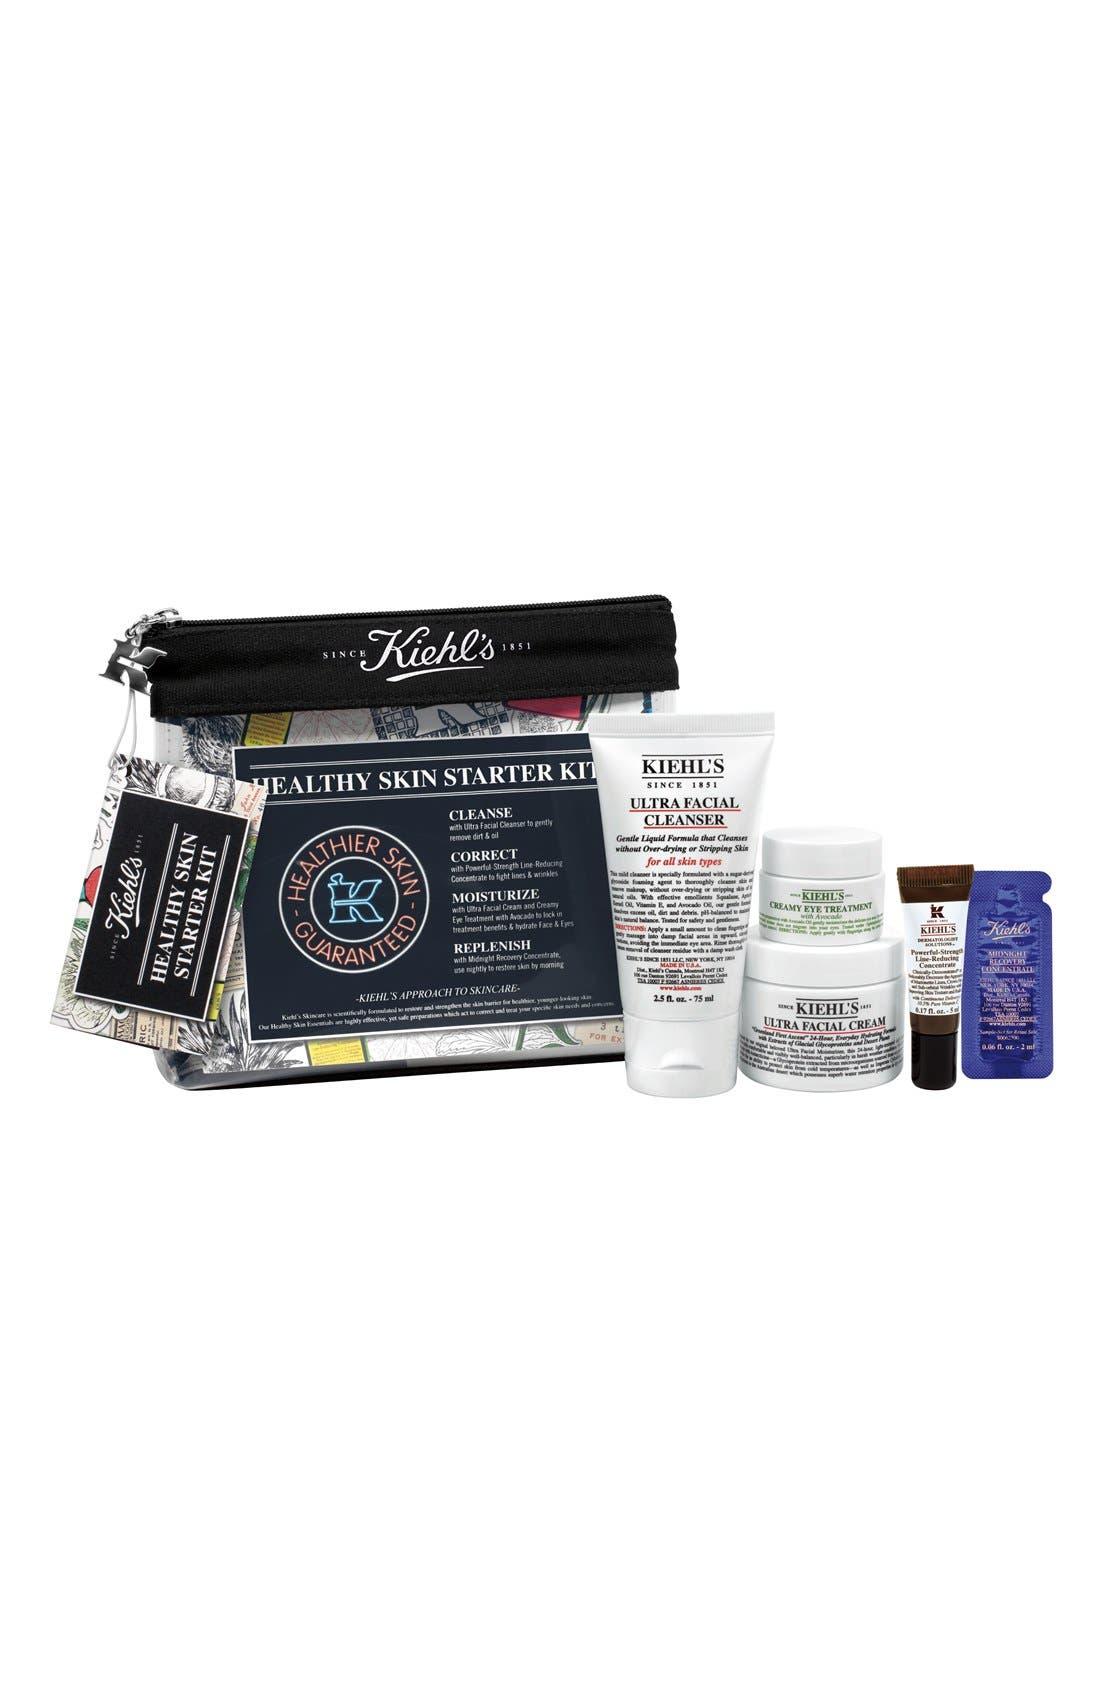 Alternate Image 1 Selected - Kiehl's Since 1851 'Healthy Skin Essentials' Starter Kit ($73 Value)